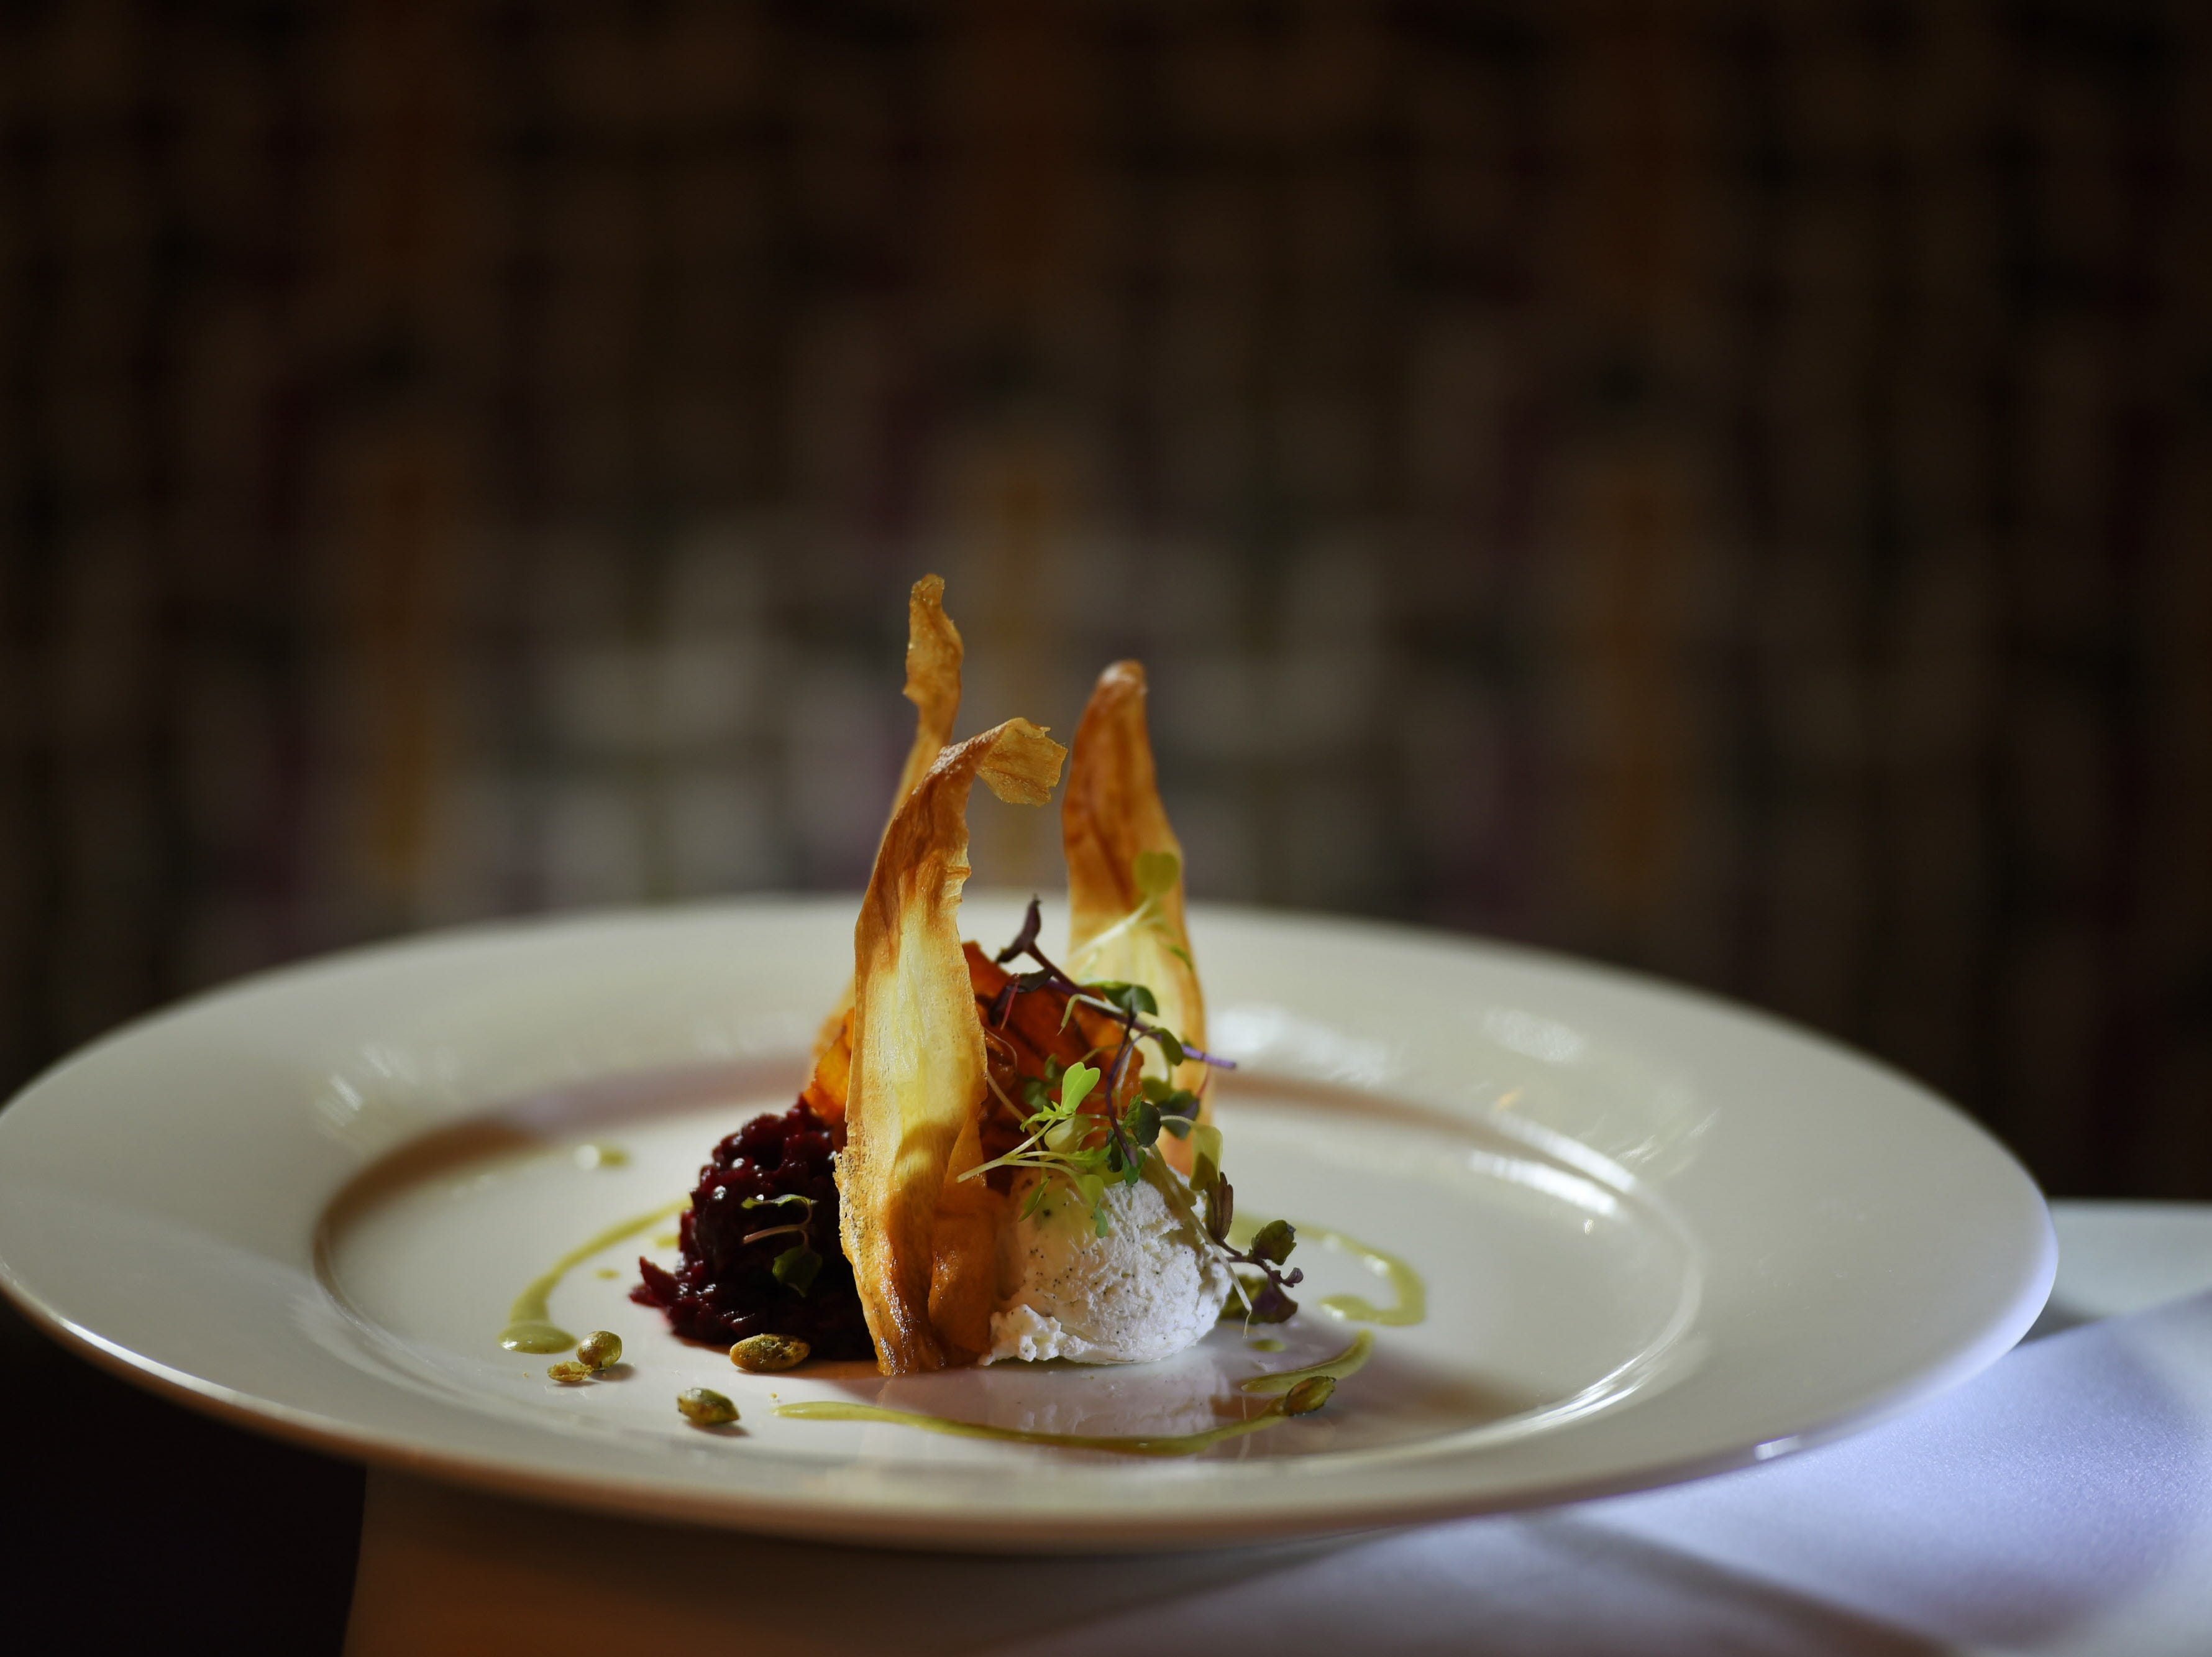 Beet tartare at Cafe Matisse